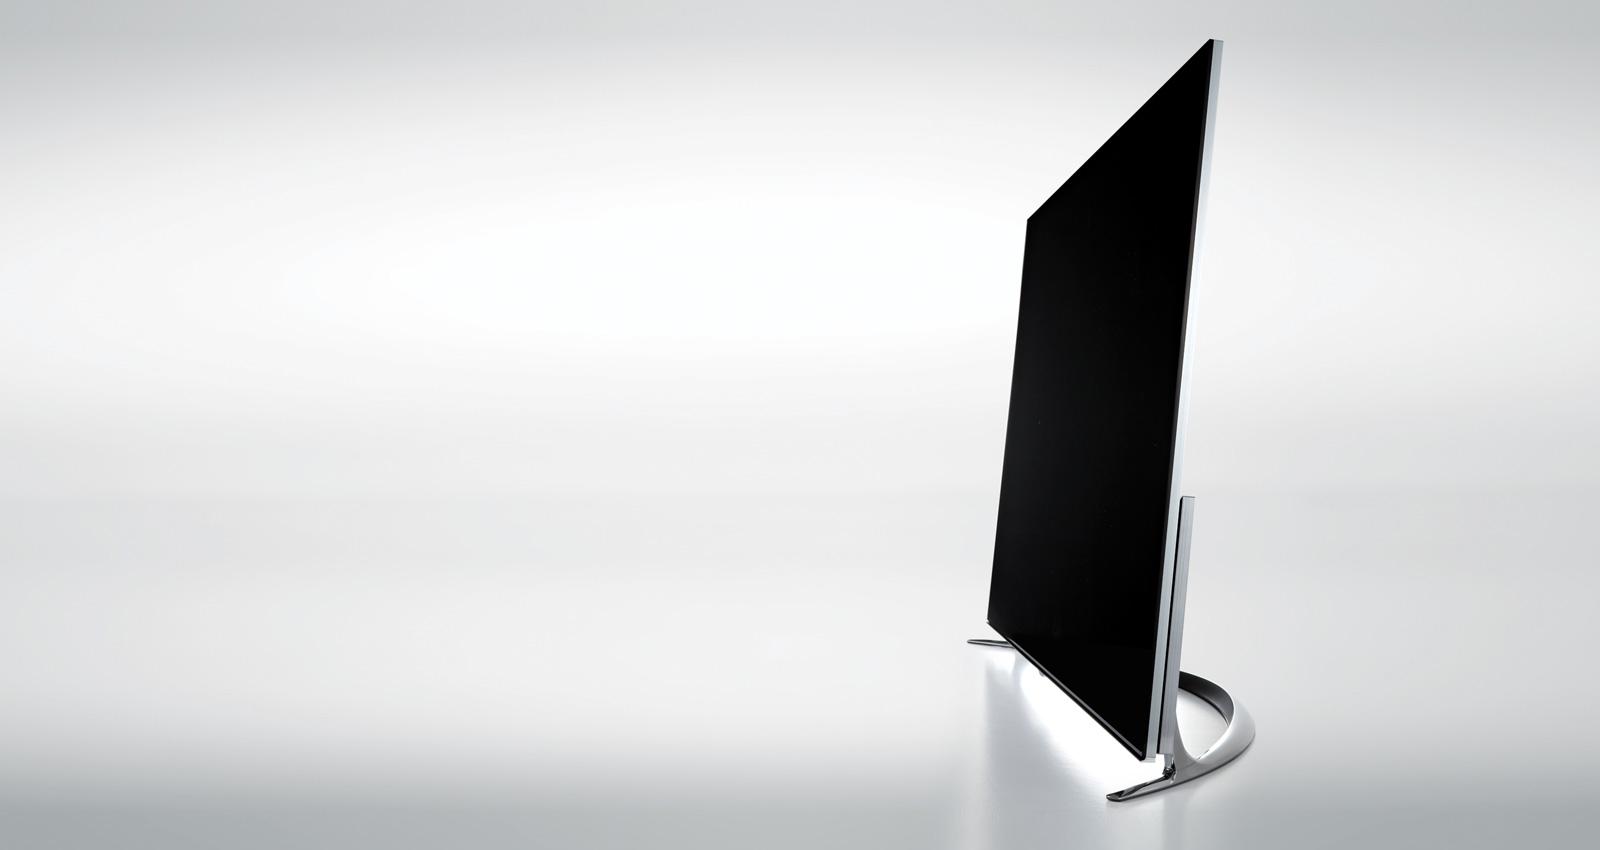 Samsung f8000